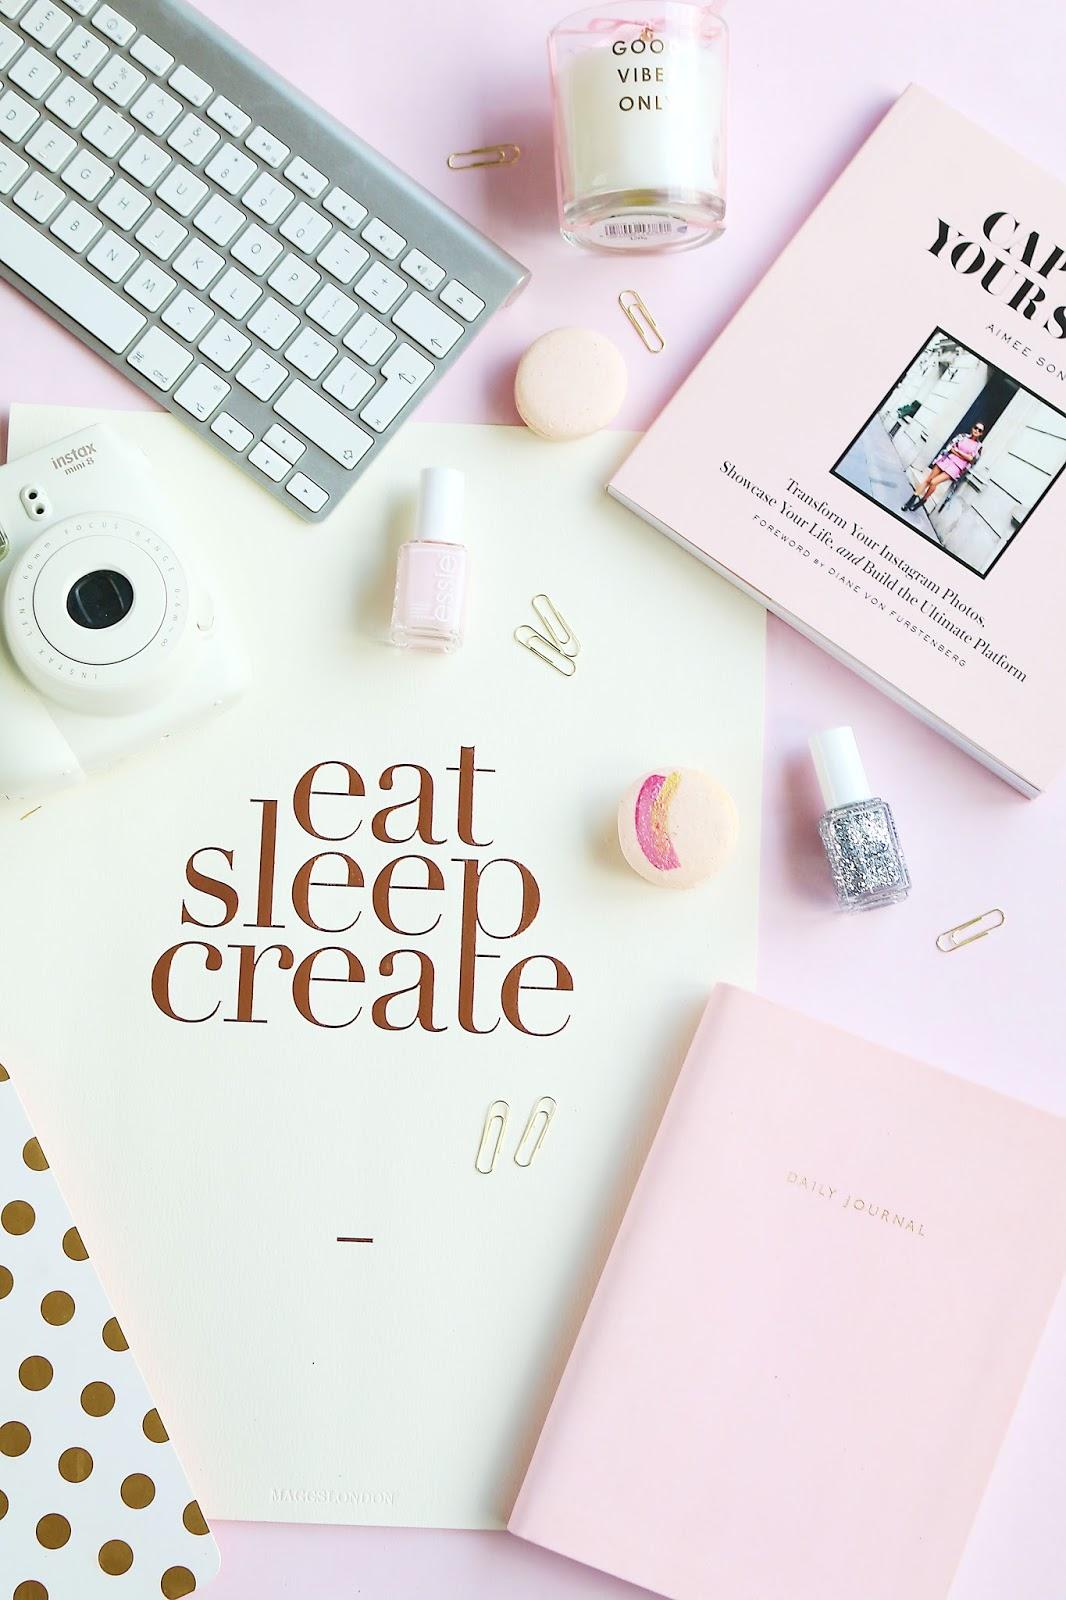 Lifestyle, blogging, Blogging advice, my blog resolutions, 2017 Blog resolutions, new year resolutions, flat lay, pink, blush pink, blush pink flat lay, pink flat lay